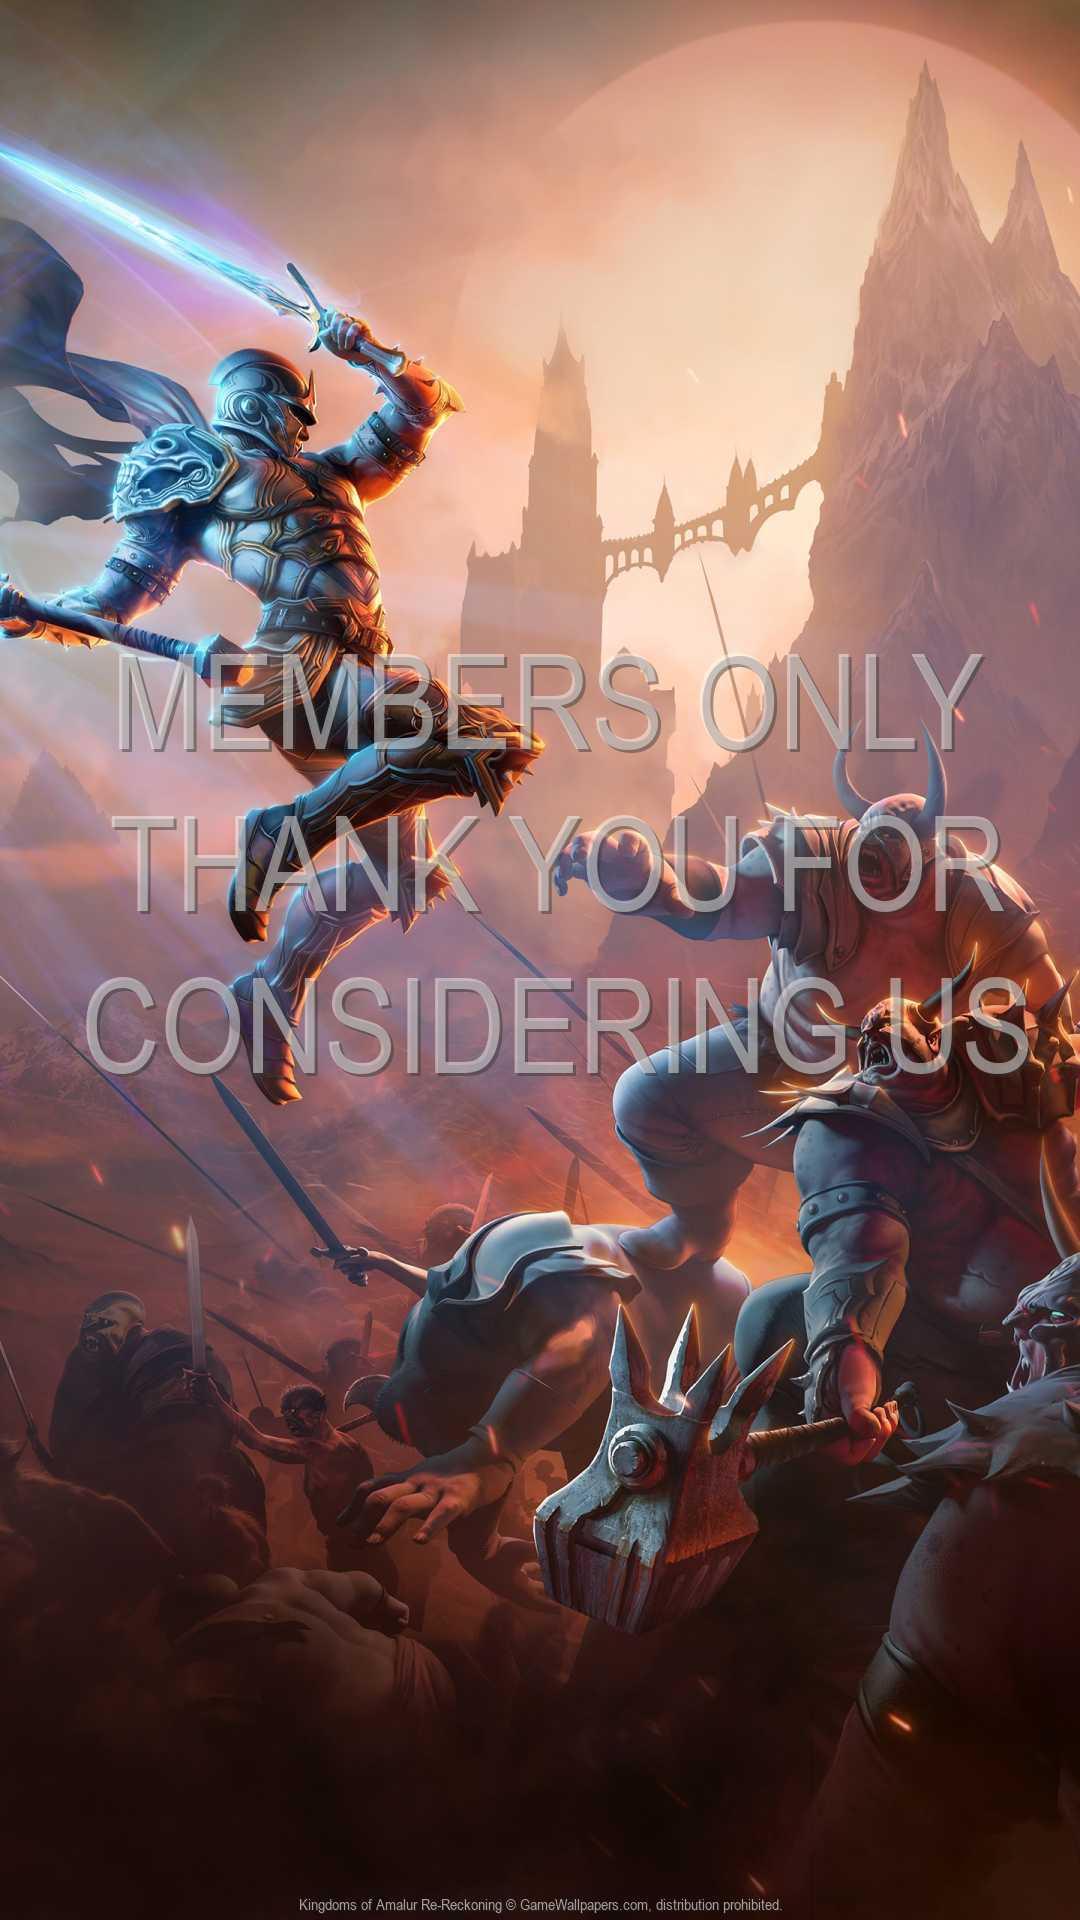 Kingdoms of Amalur: Re-Reckoning 1080p Vertical Mobile wallpaper or background 01